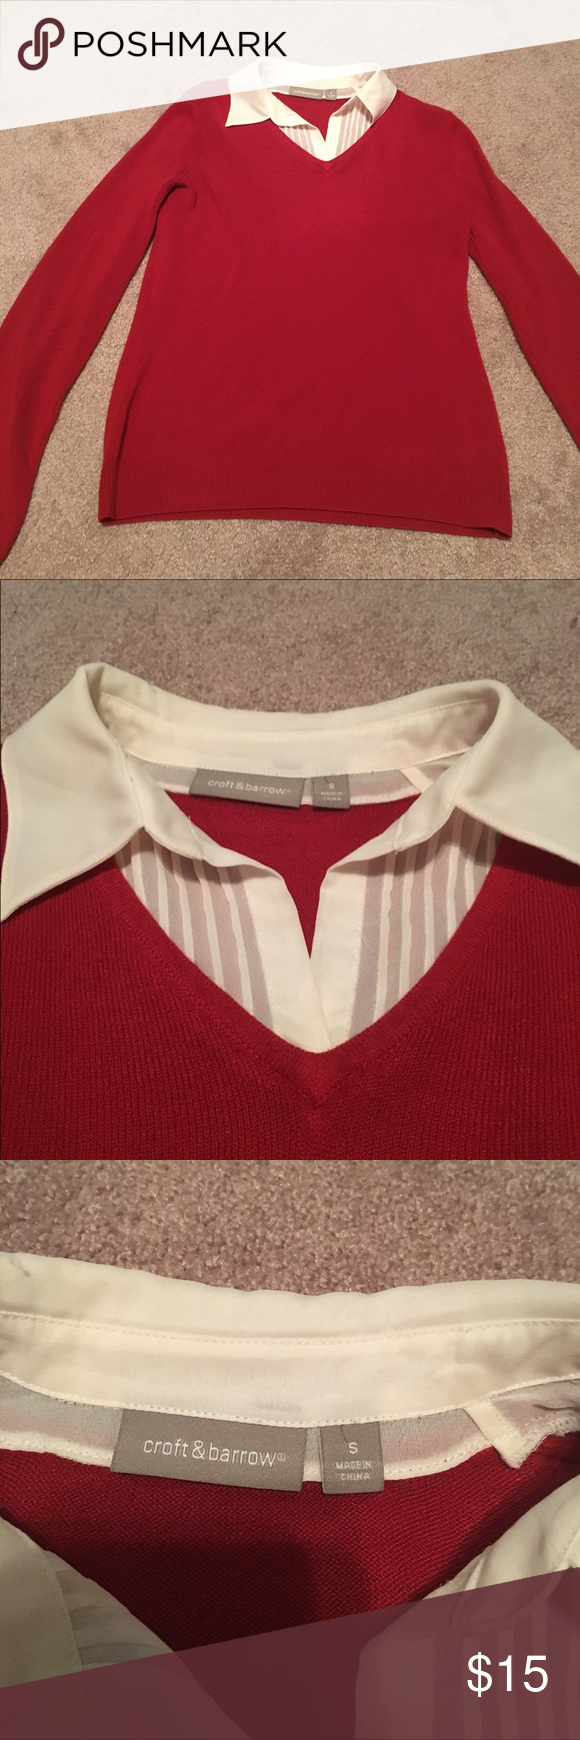 Croft & Barrow sweater. Red. Small. EUC Croft & Barrow sweater. Red. Small. EUC. Very comfy and cozy 😀 croft & barrow Sweaters V-Necks